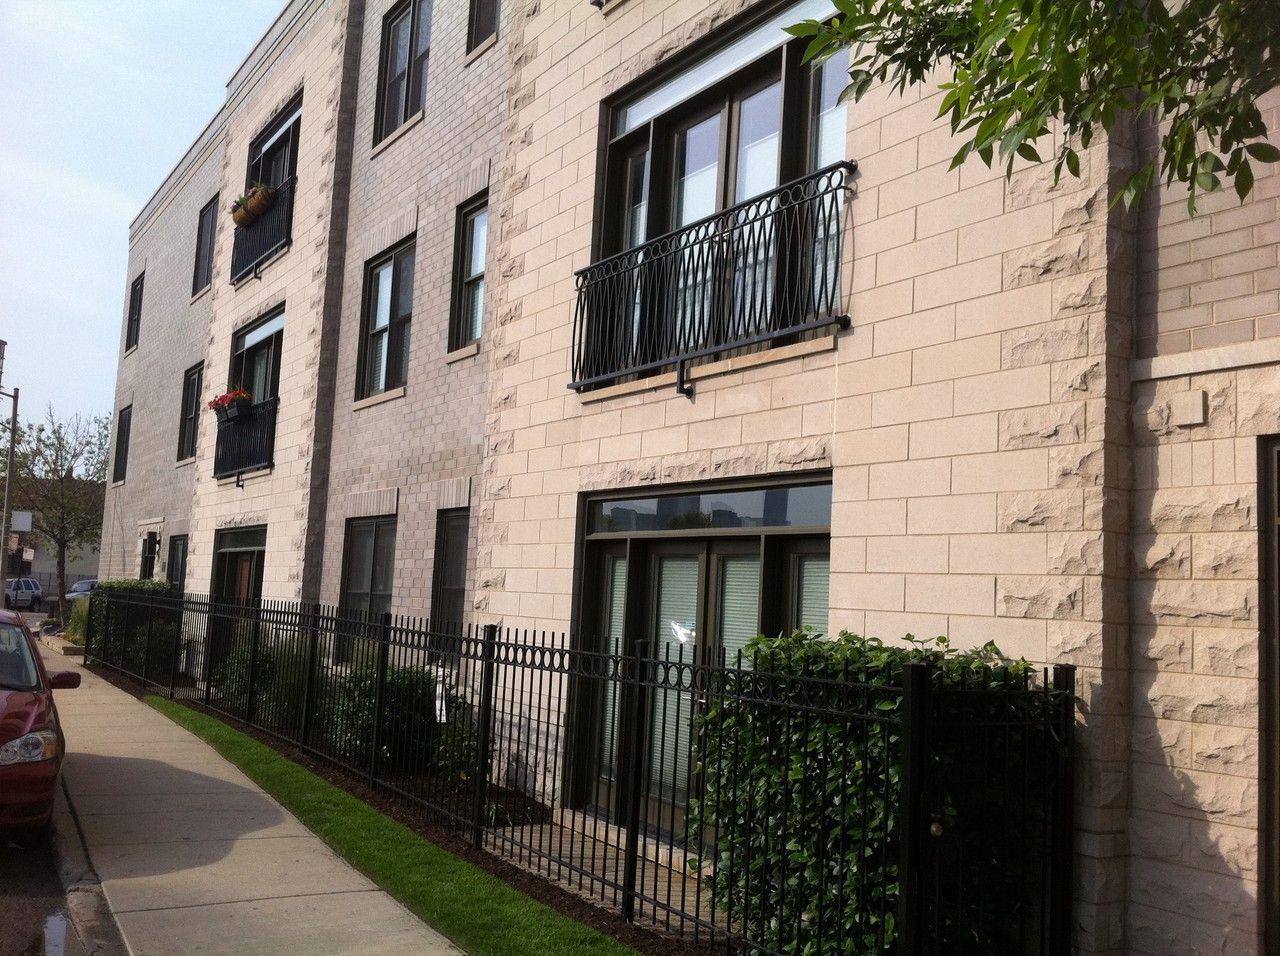 744 N. Willard #302 - 302 Apartments for Rent - 744 N ...